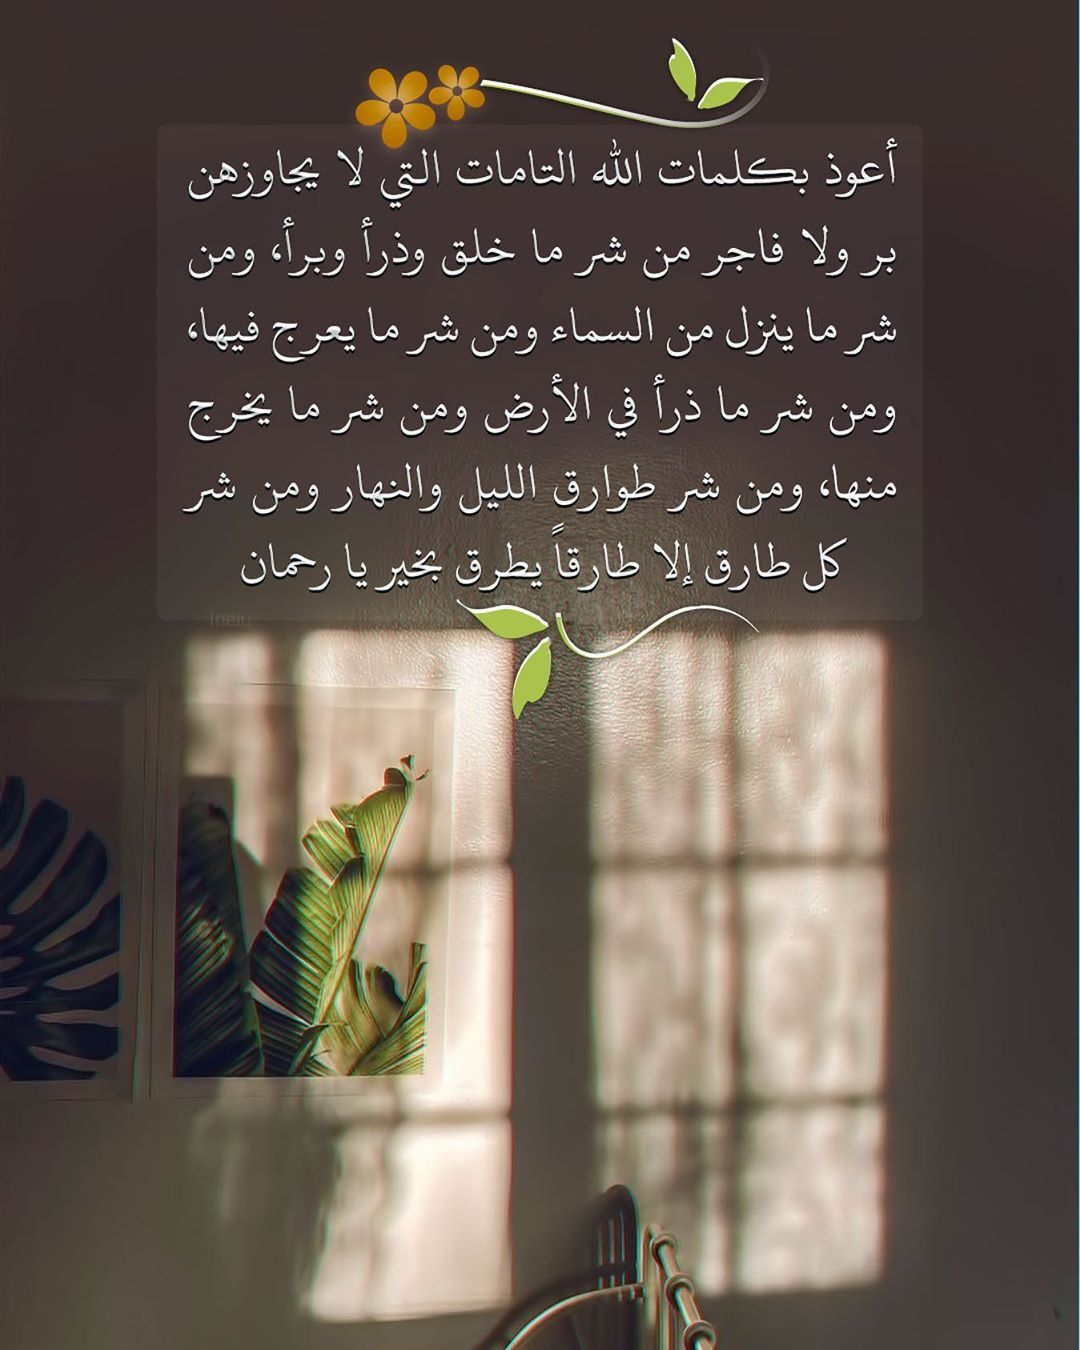 2 367 Likes 15 Comments Pearla0203 On Instagram أعوذ بكلمات الله التامات التي لا يجاوزهن بر ول Islamic Quotes Islamic Quotes Quran Islamic Phrases